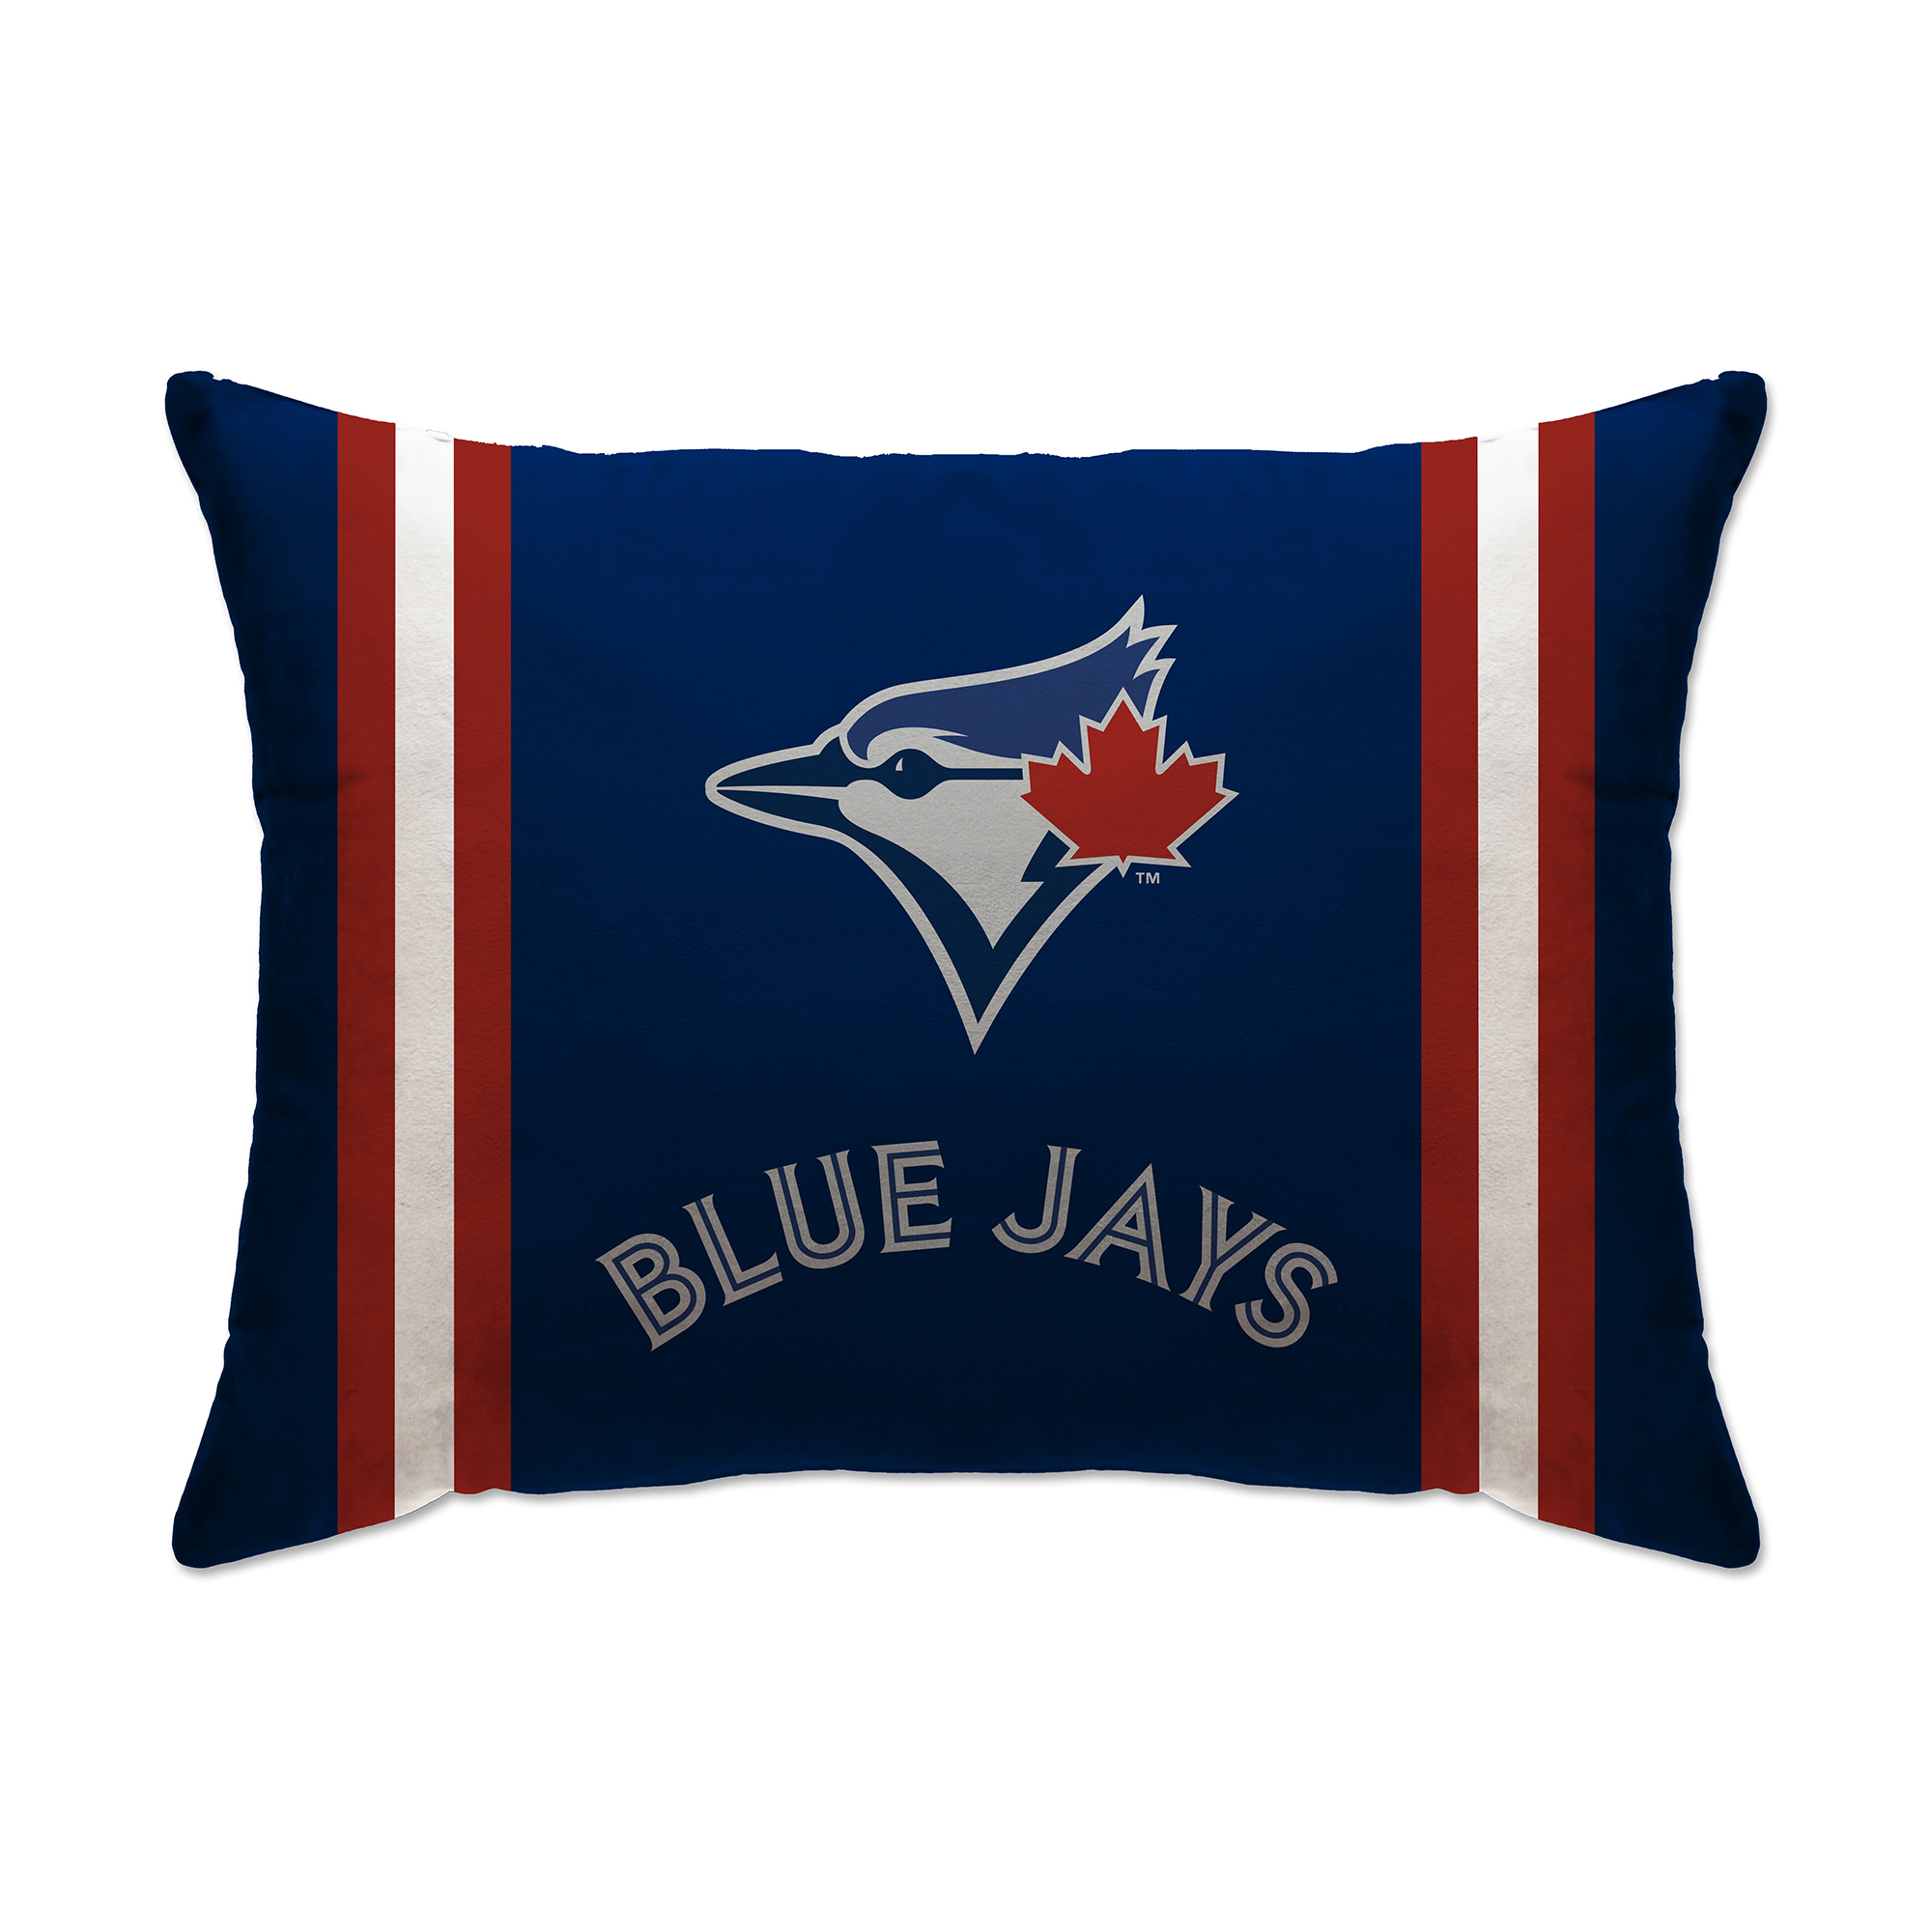 "Toronto Blue Jays 20"" x 26"" Plush Bed Pillow - Blue - No Size"